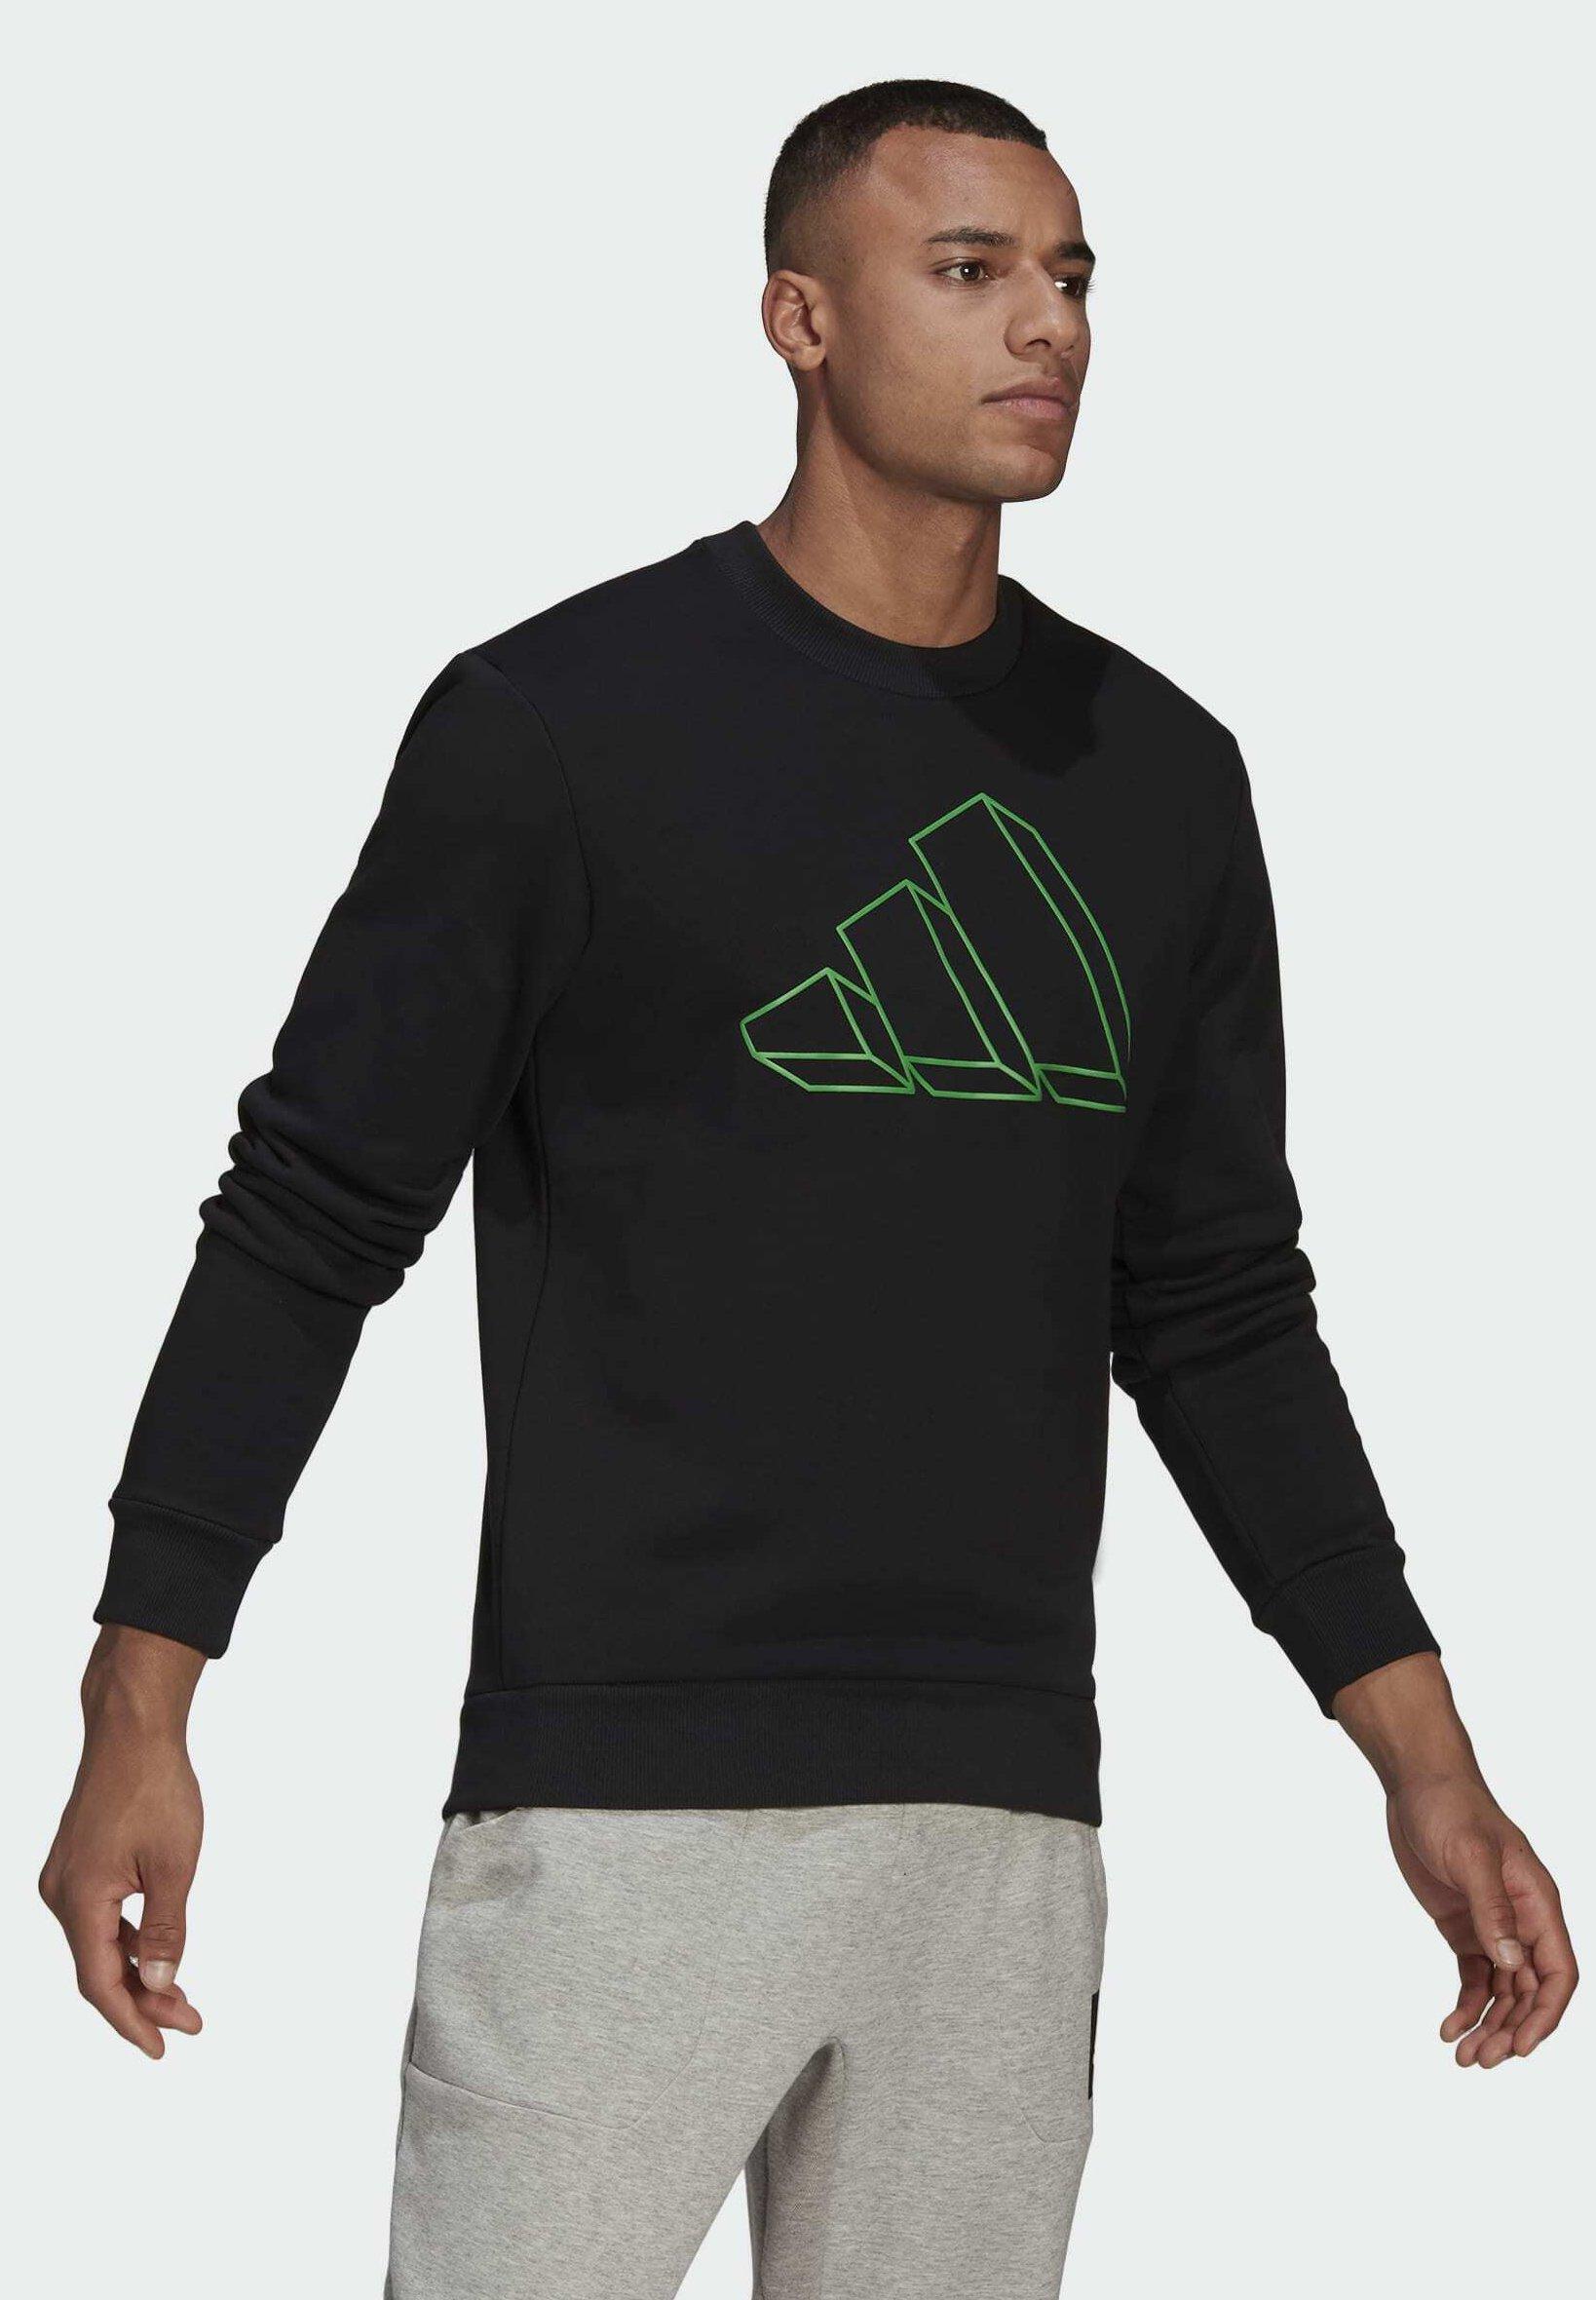 Herren M FI Graphic CREW BD MUST HAVES SPORTS REGULAR PULLOVER SWEATSHIRT - Sweatshirt